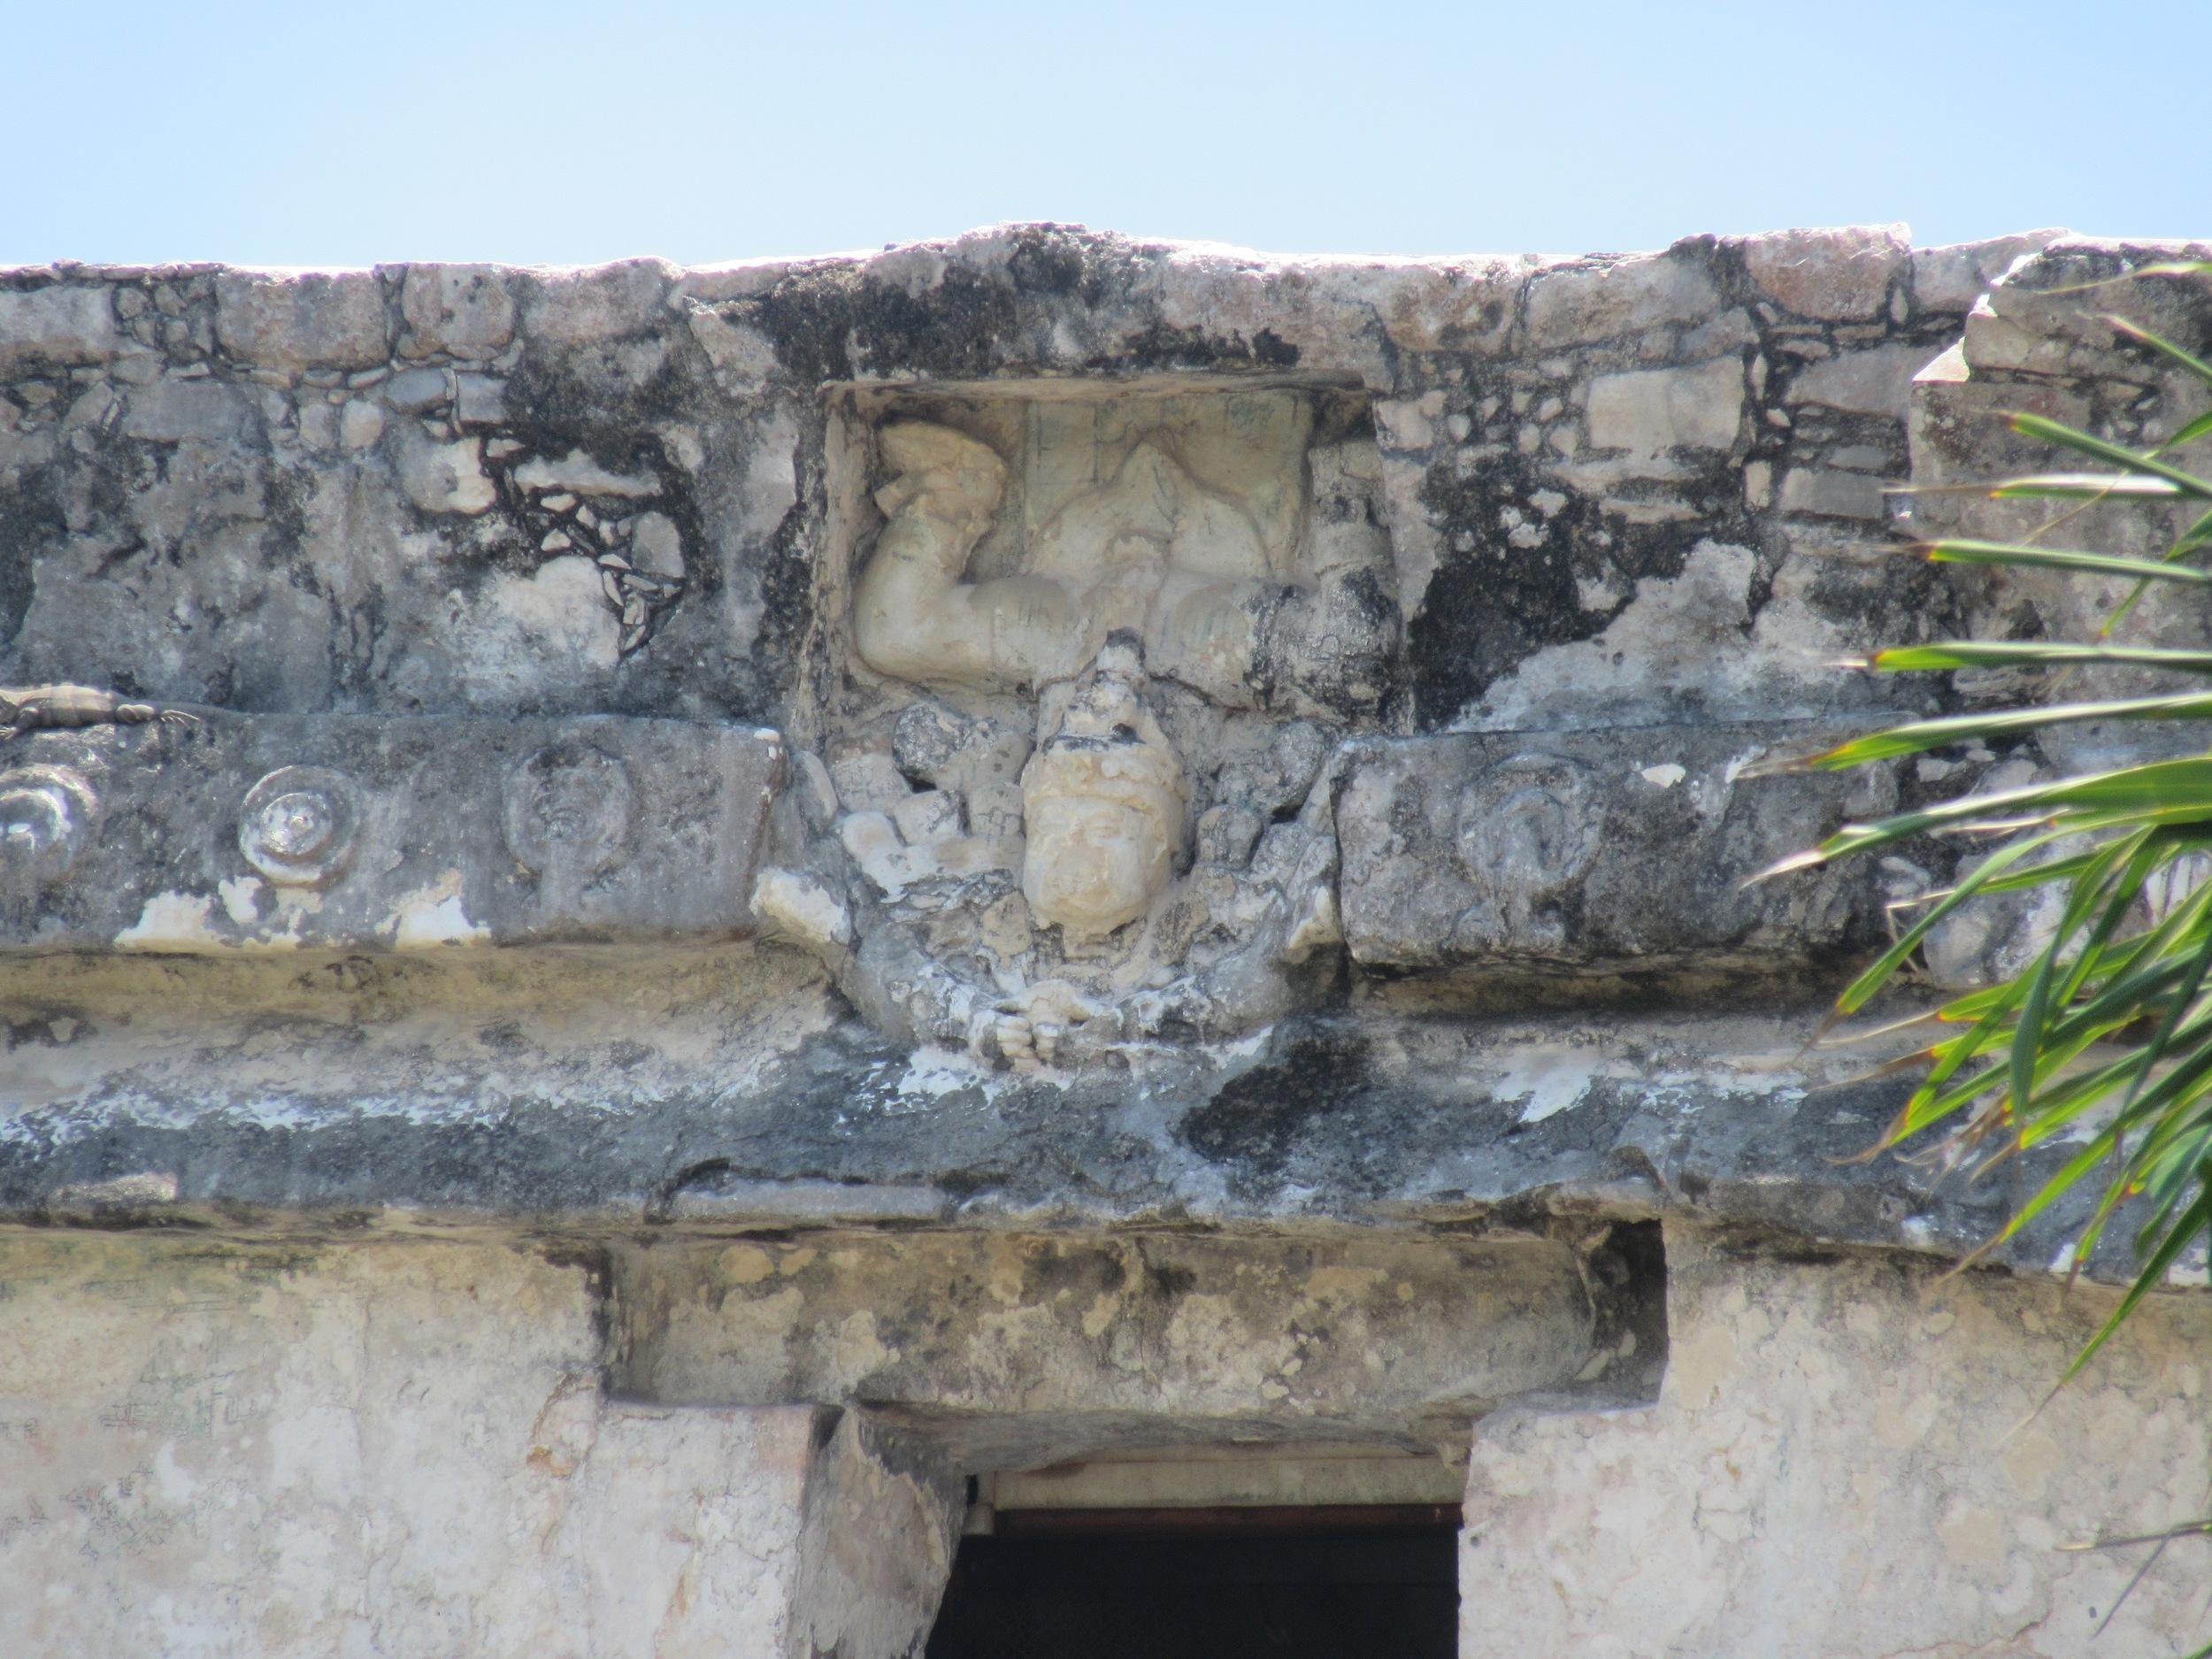 ONE OF THE MAIN FRESCOS ON EL CASTILLO